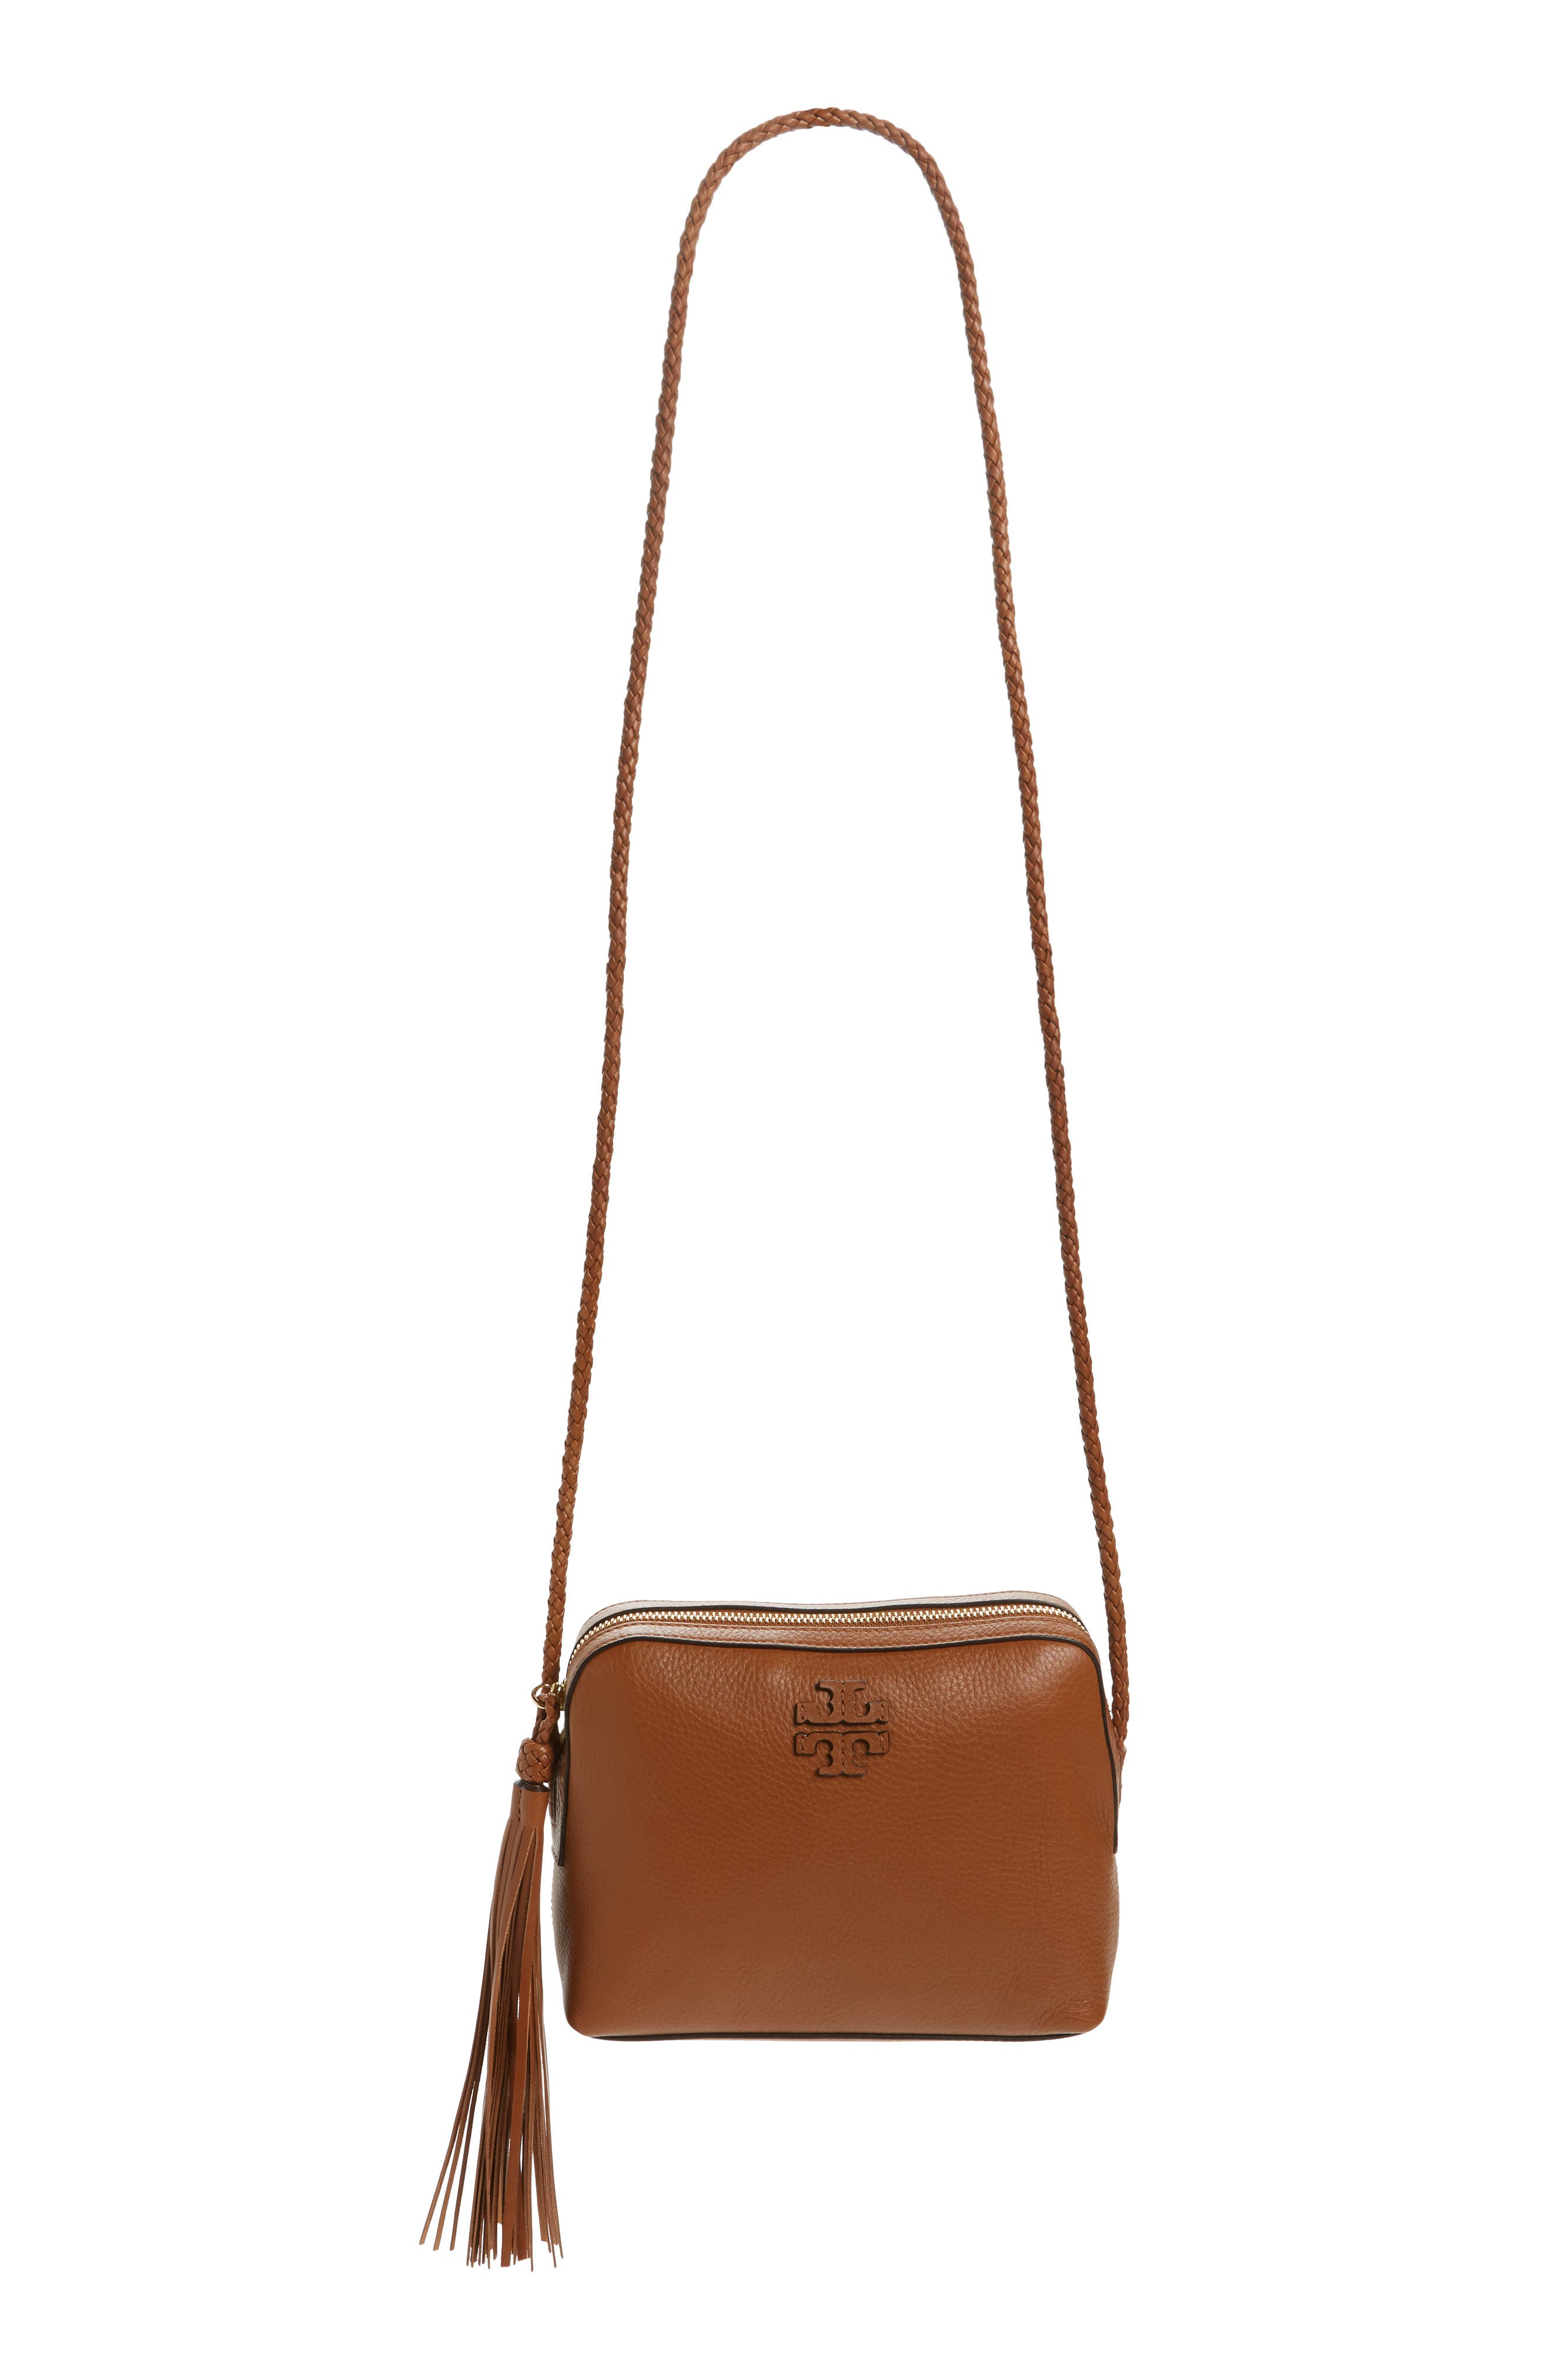 Main Image - Tory Burch Taylor Leather Camera Bag